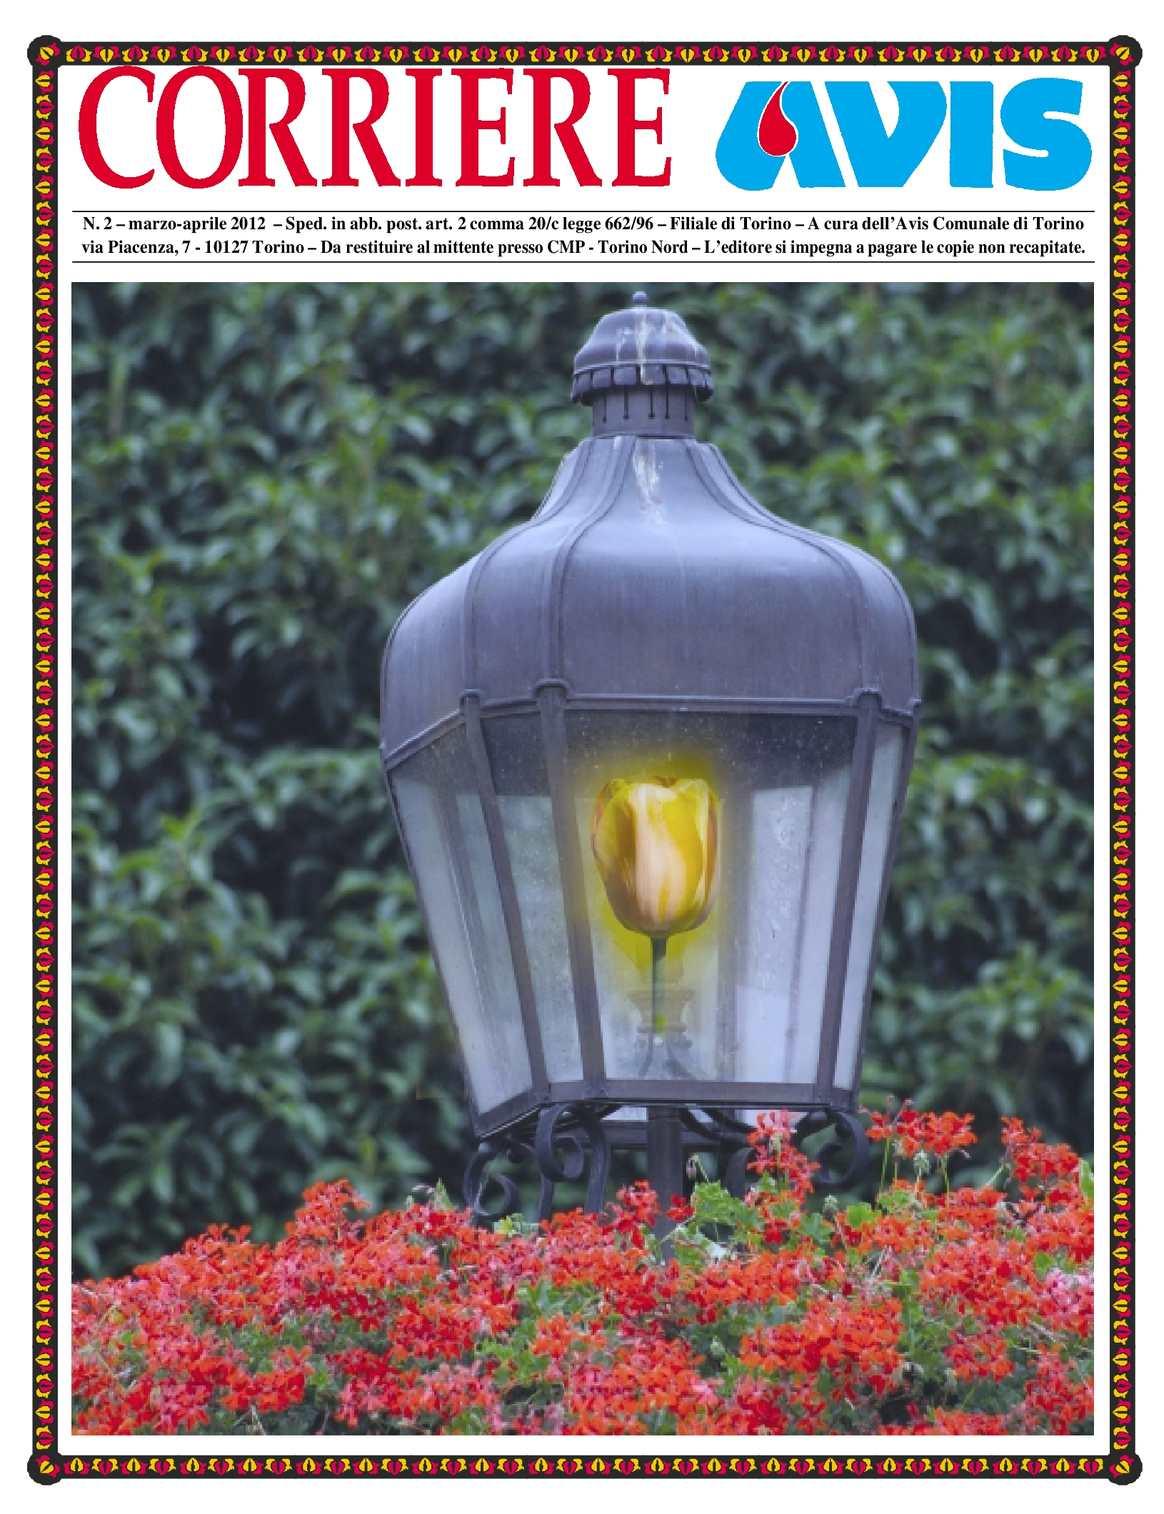 LEGGE COSTITUZIONALE 20 aprile 2012, n. 1 Introduzione del ...